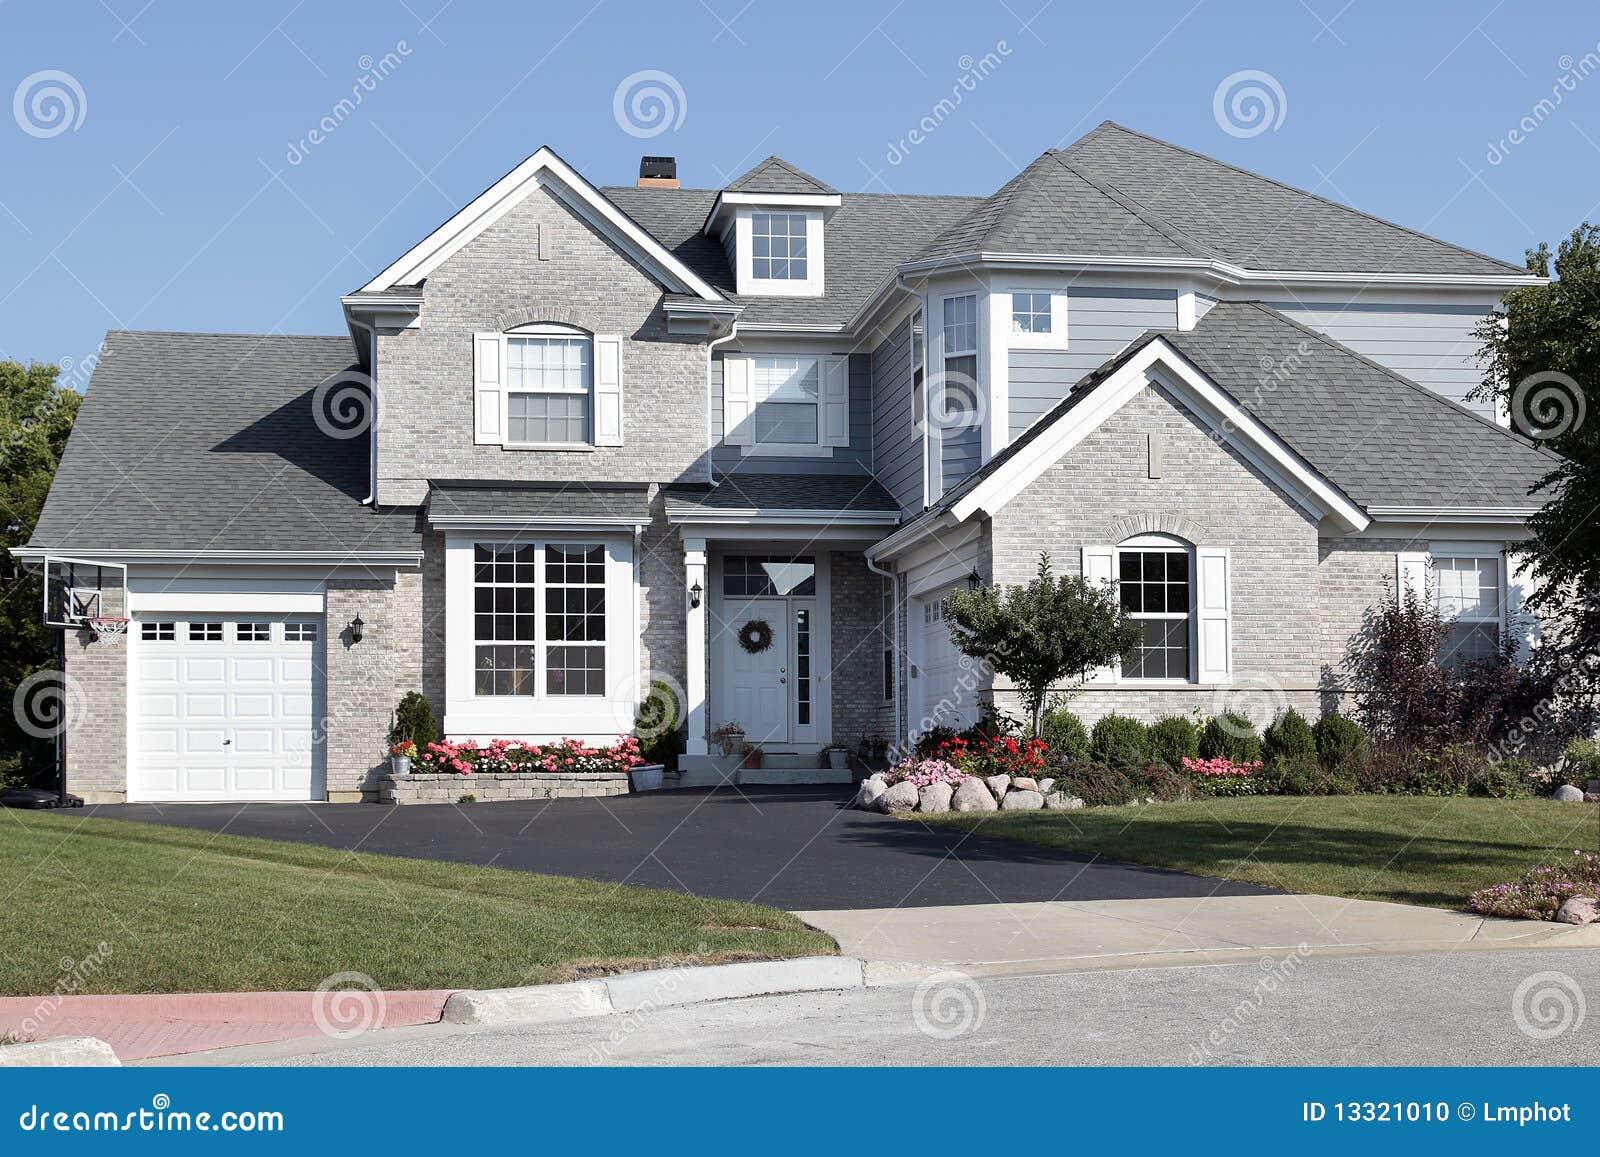 Brick House With Blue Siding Stock Photo Image 13321010